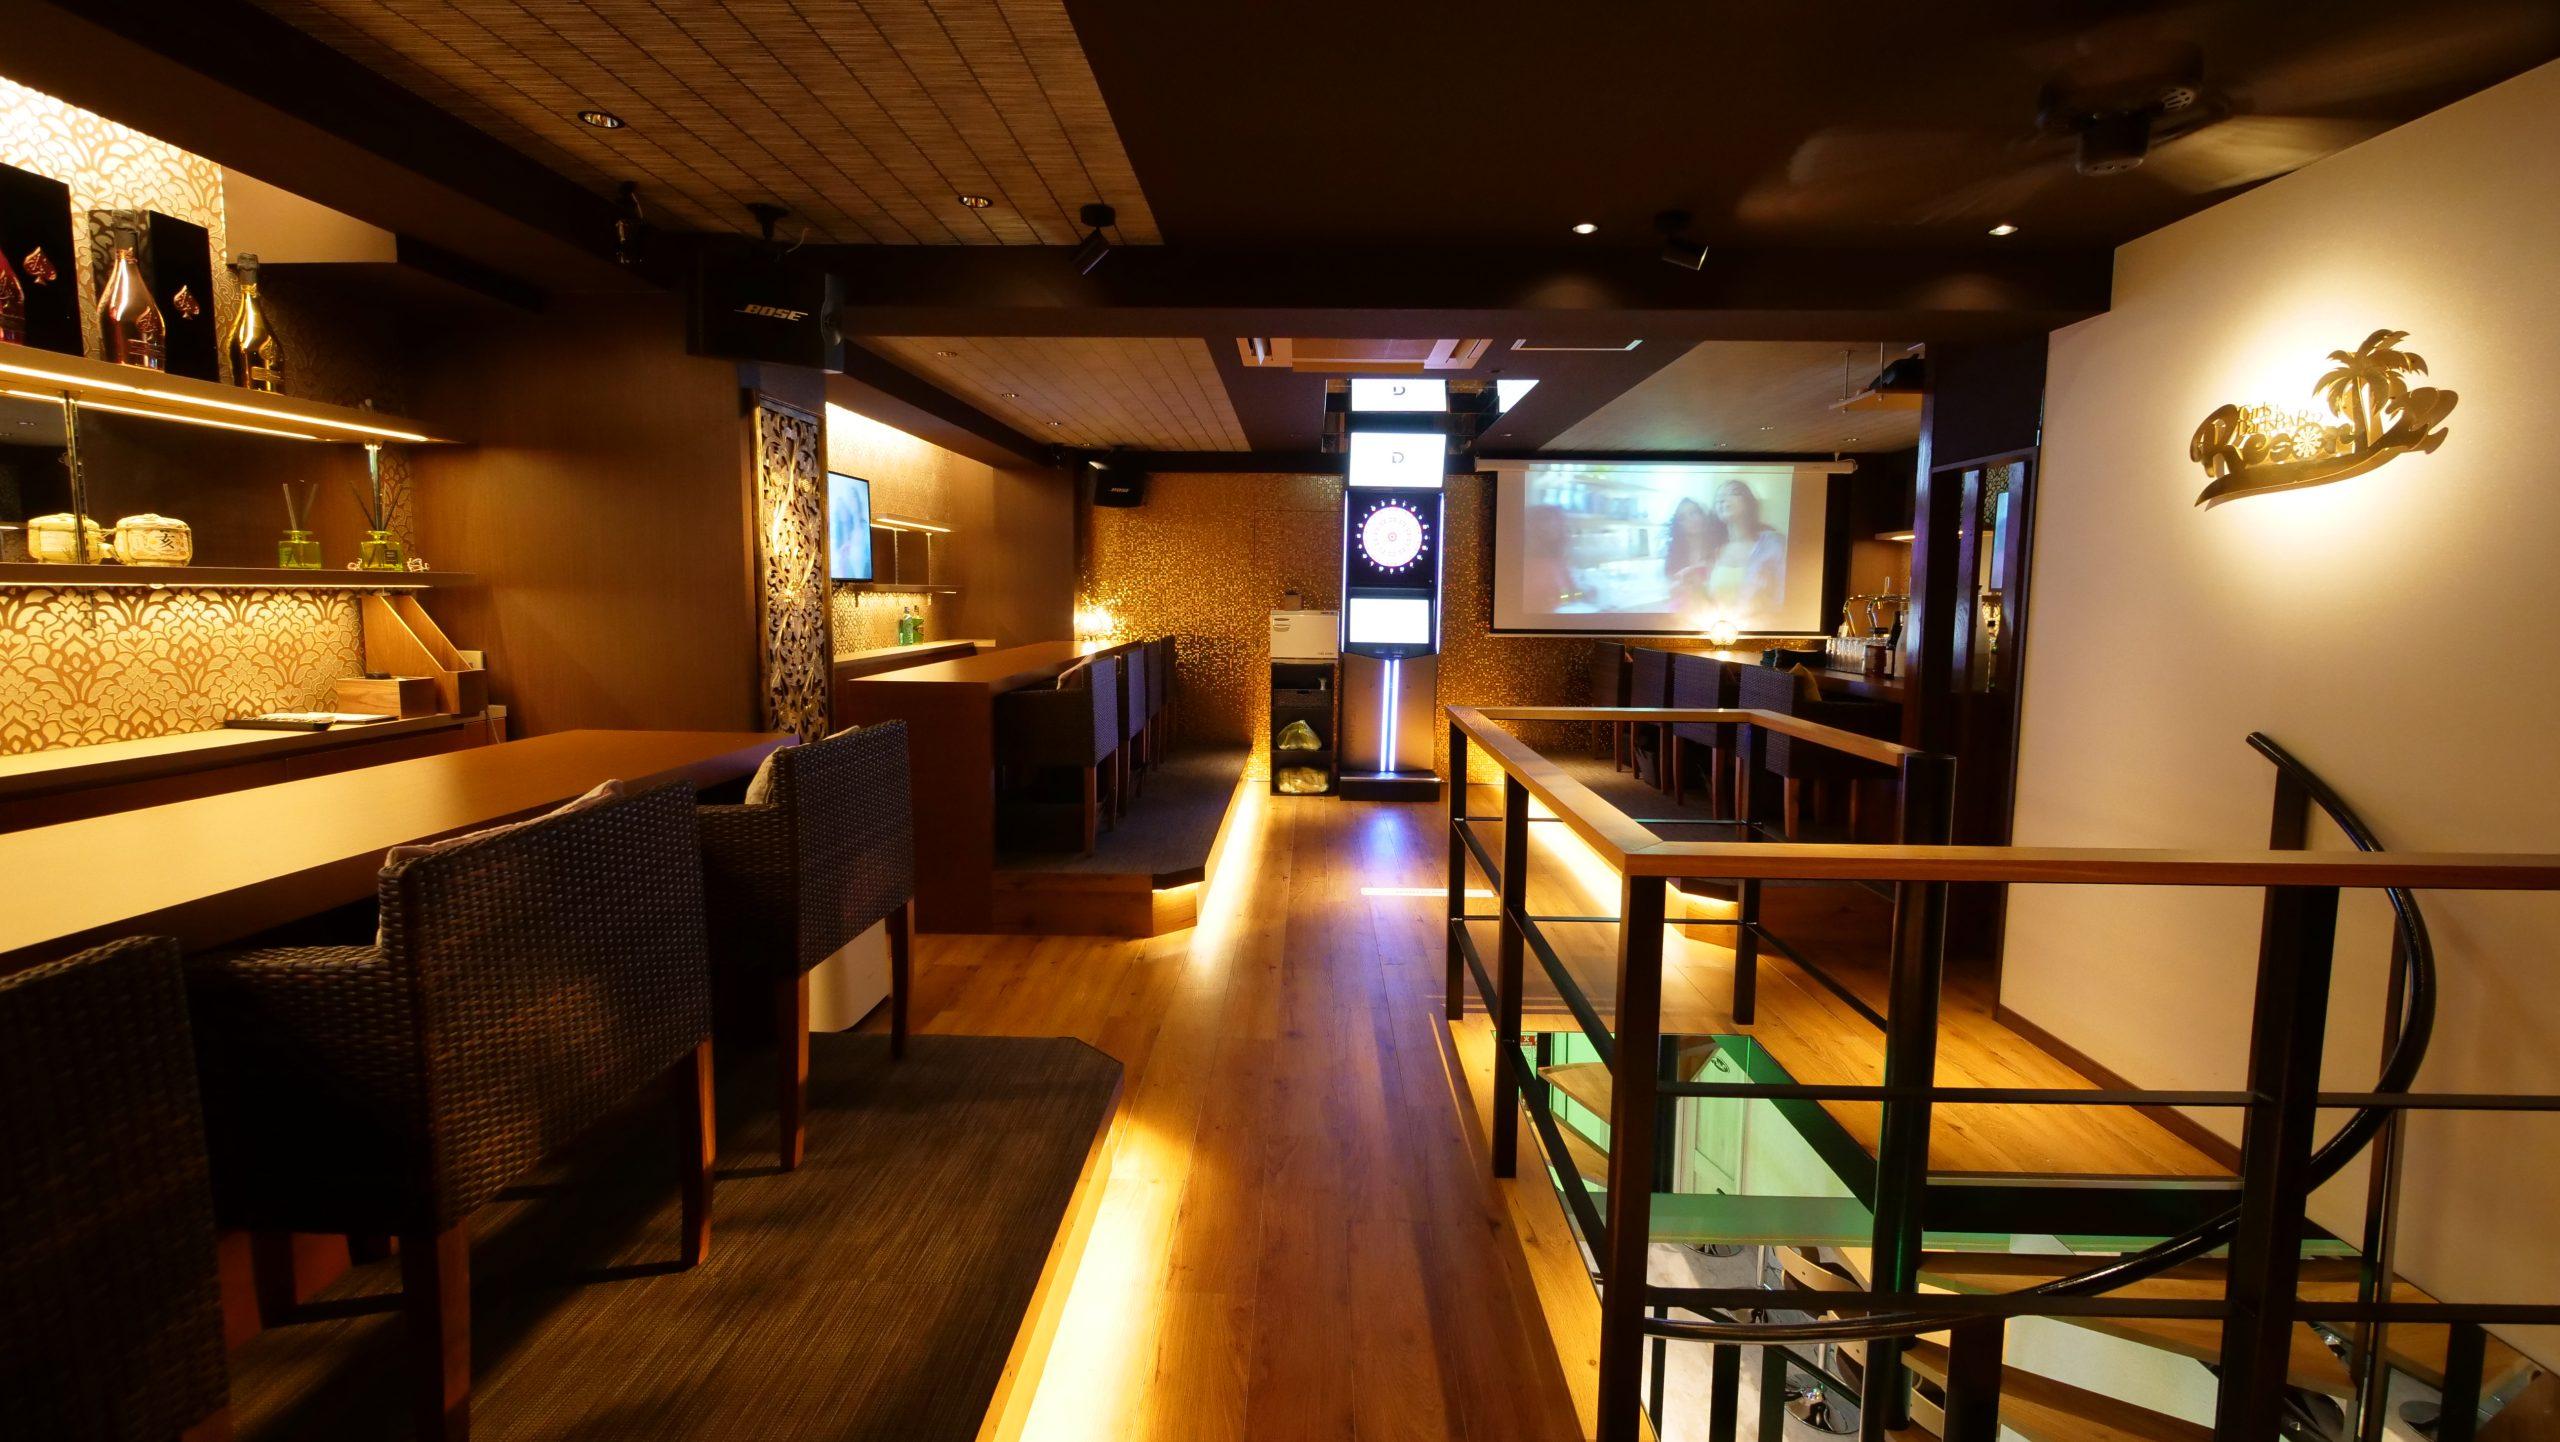 P1022205 scaled - 二号店グランドオープン|リゾートセカンド